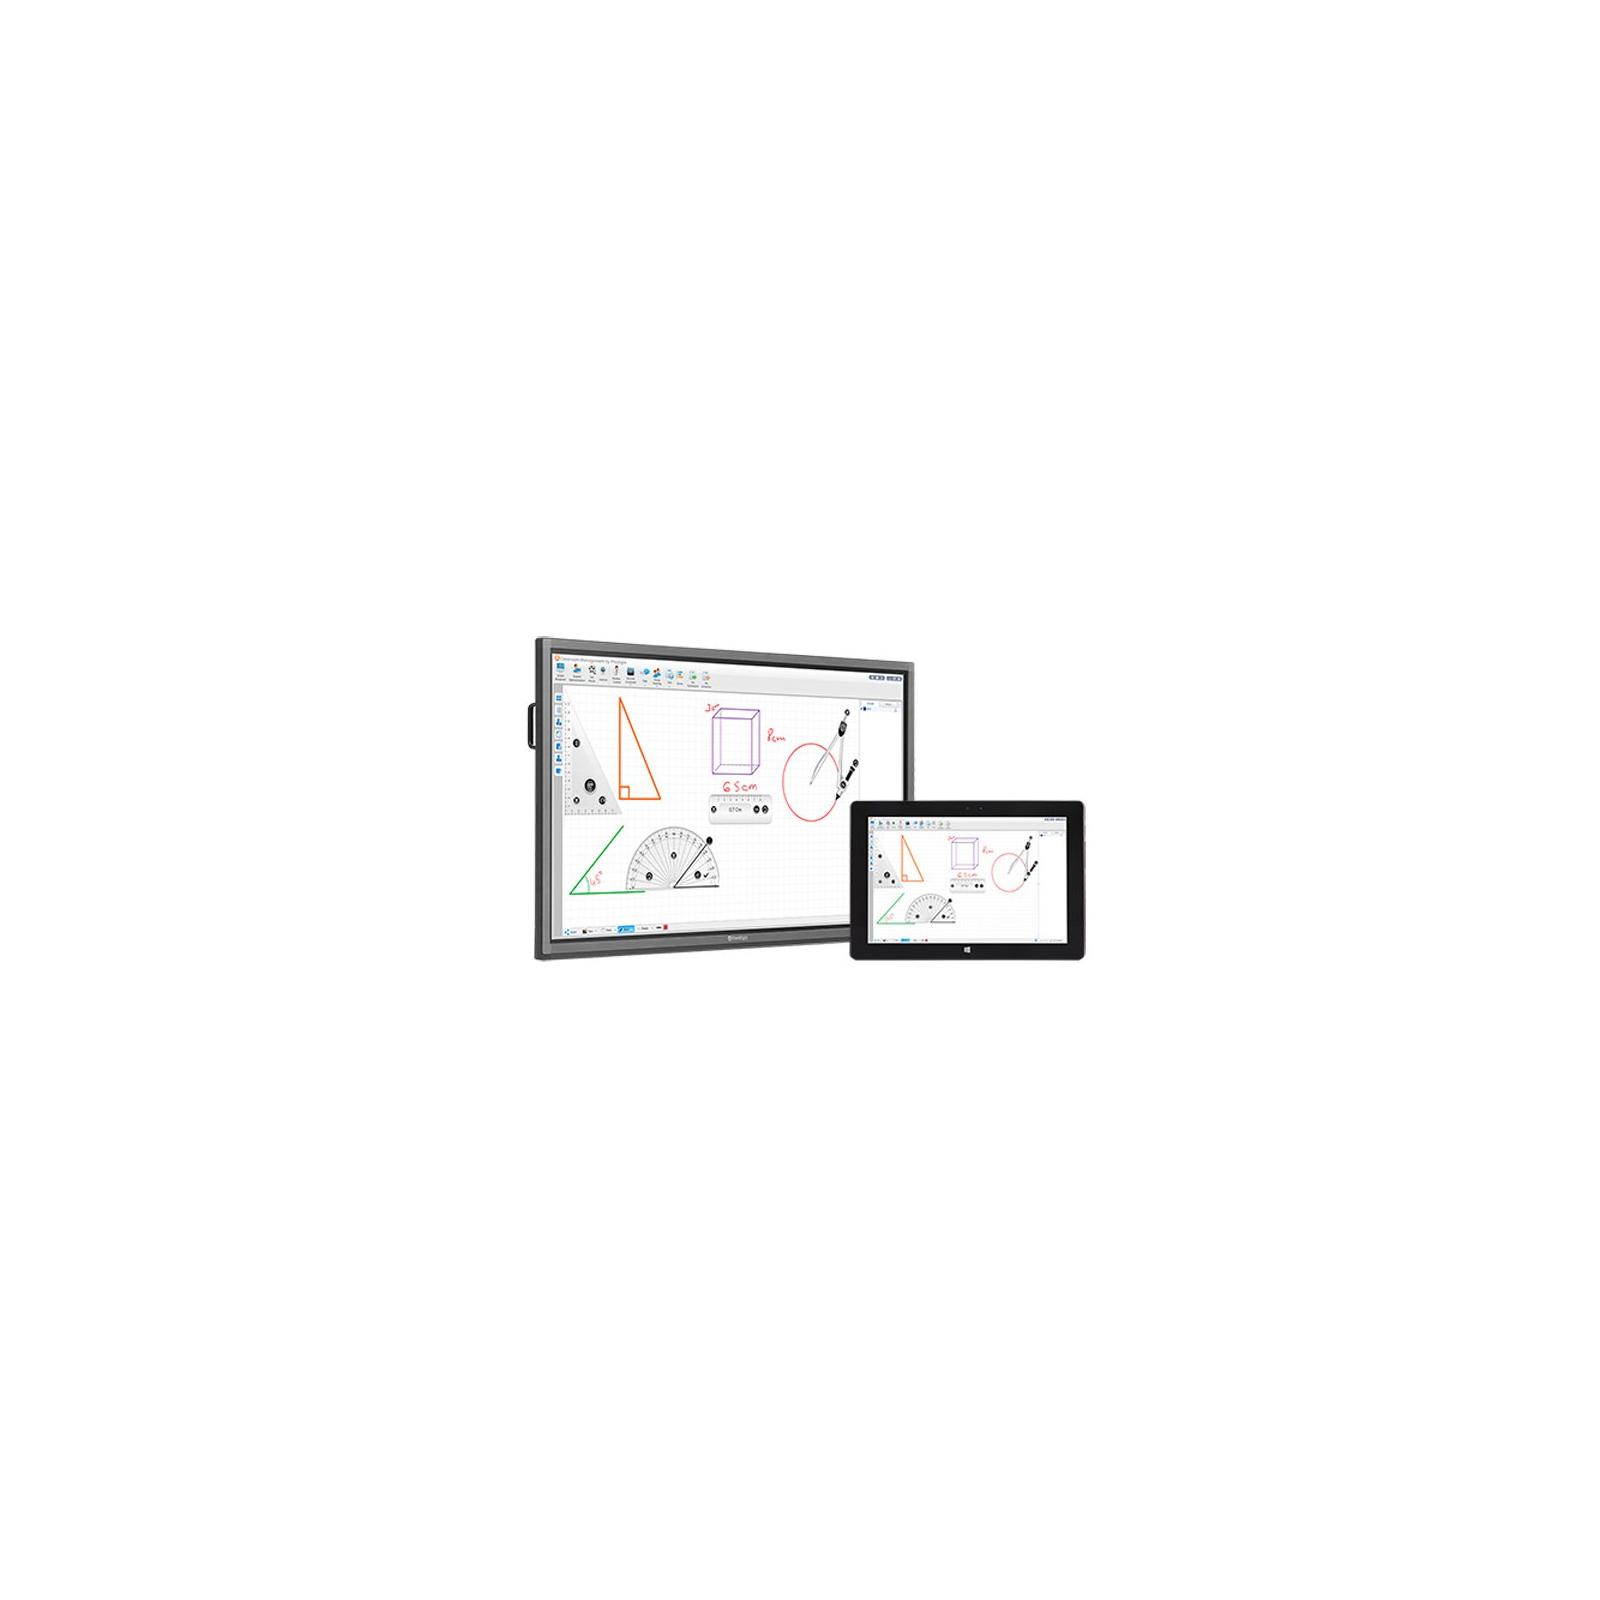 Офісний додаток PRESTIGIO Electronics license for Teaching workplace includes 2 years (83PMBAMT100)